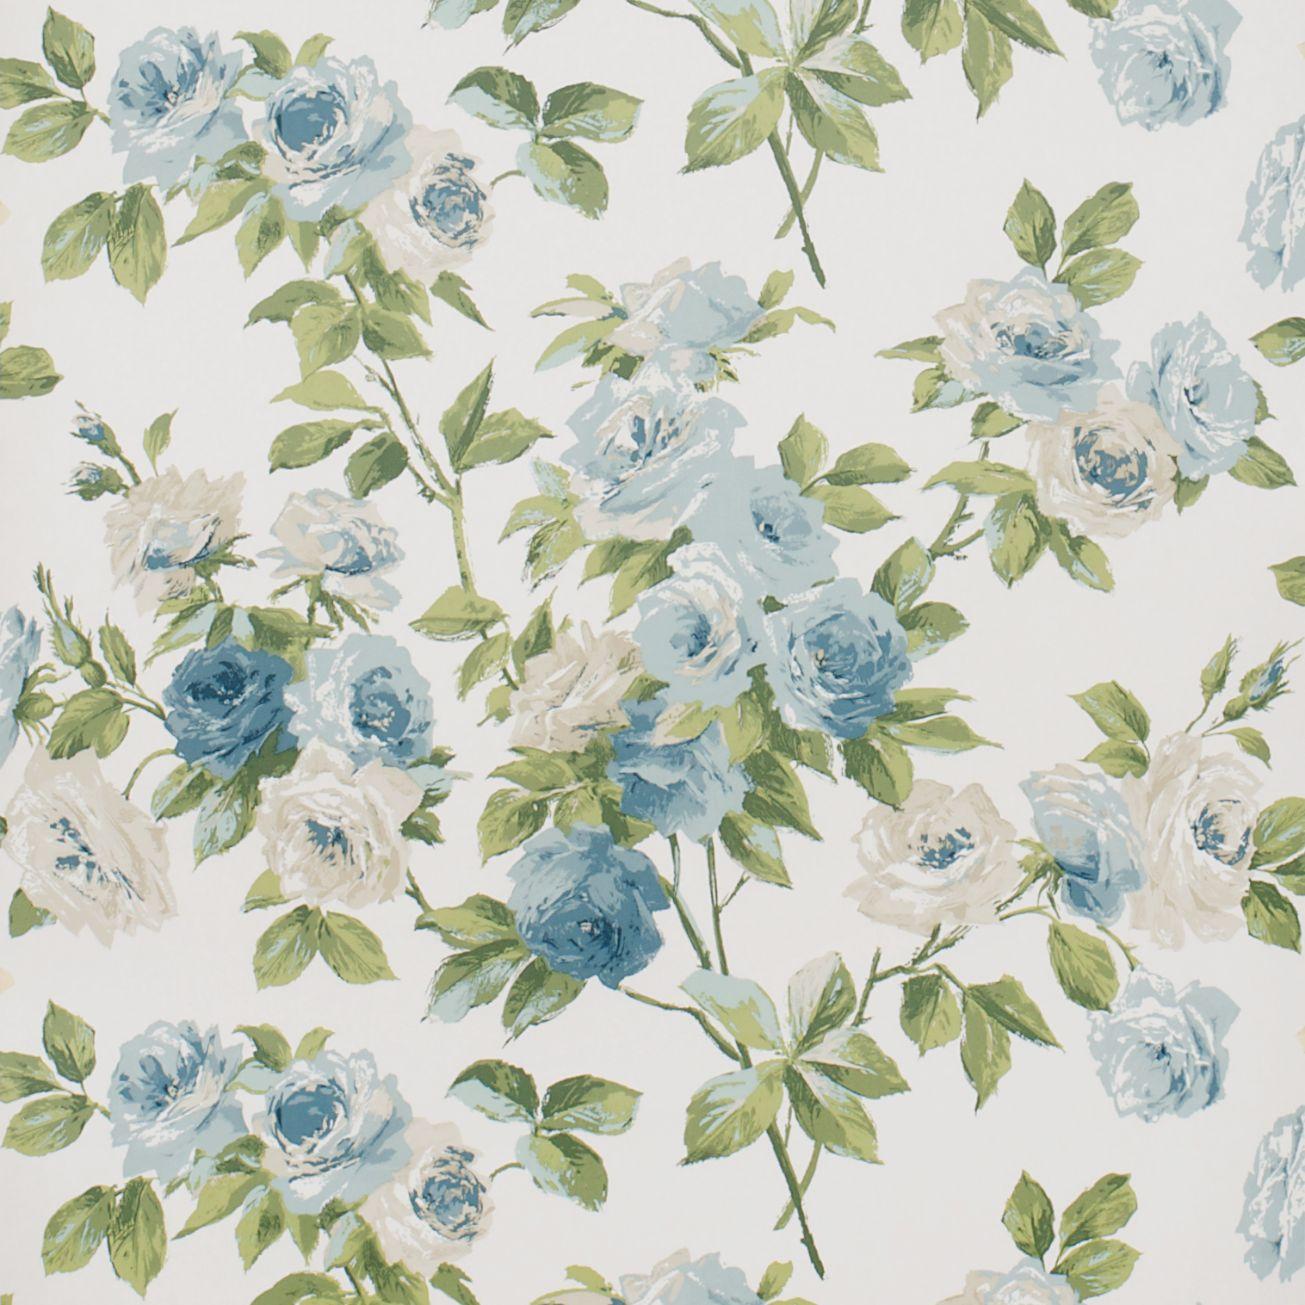 Wallpaper Vintage Wallpaper Collection Sanderson Wallpaper 1305x1305